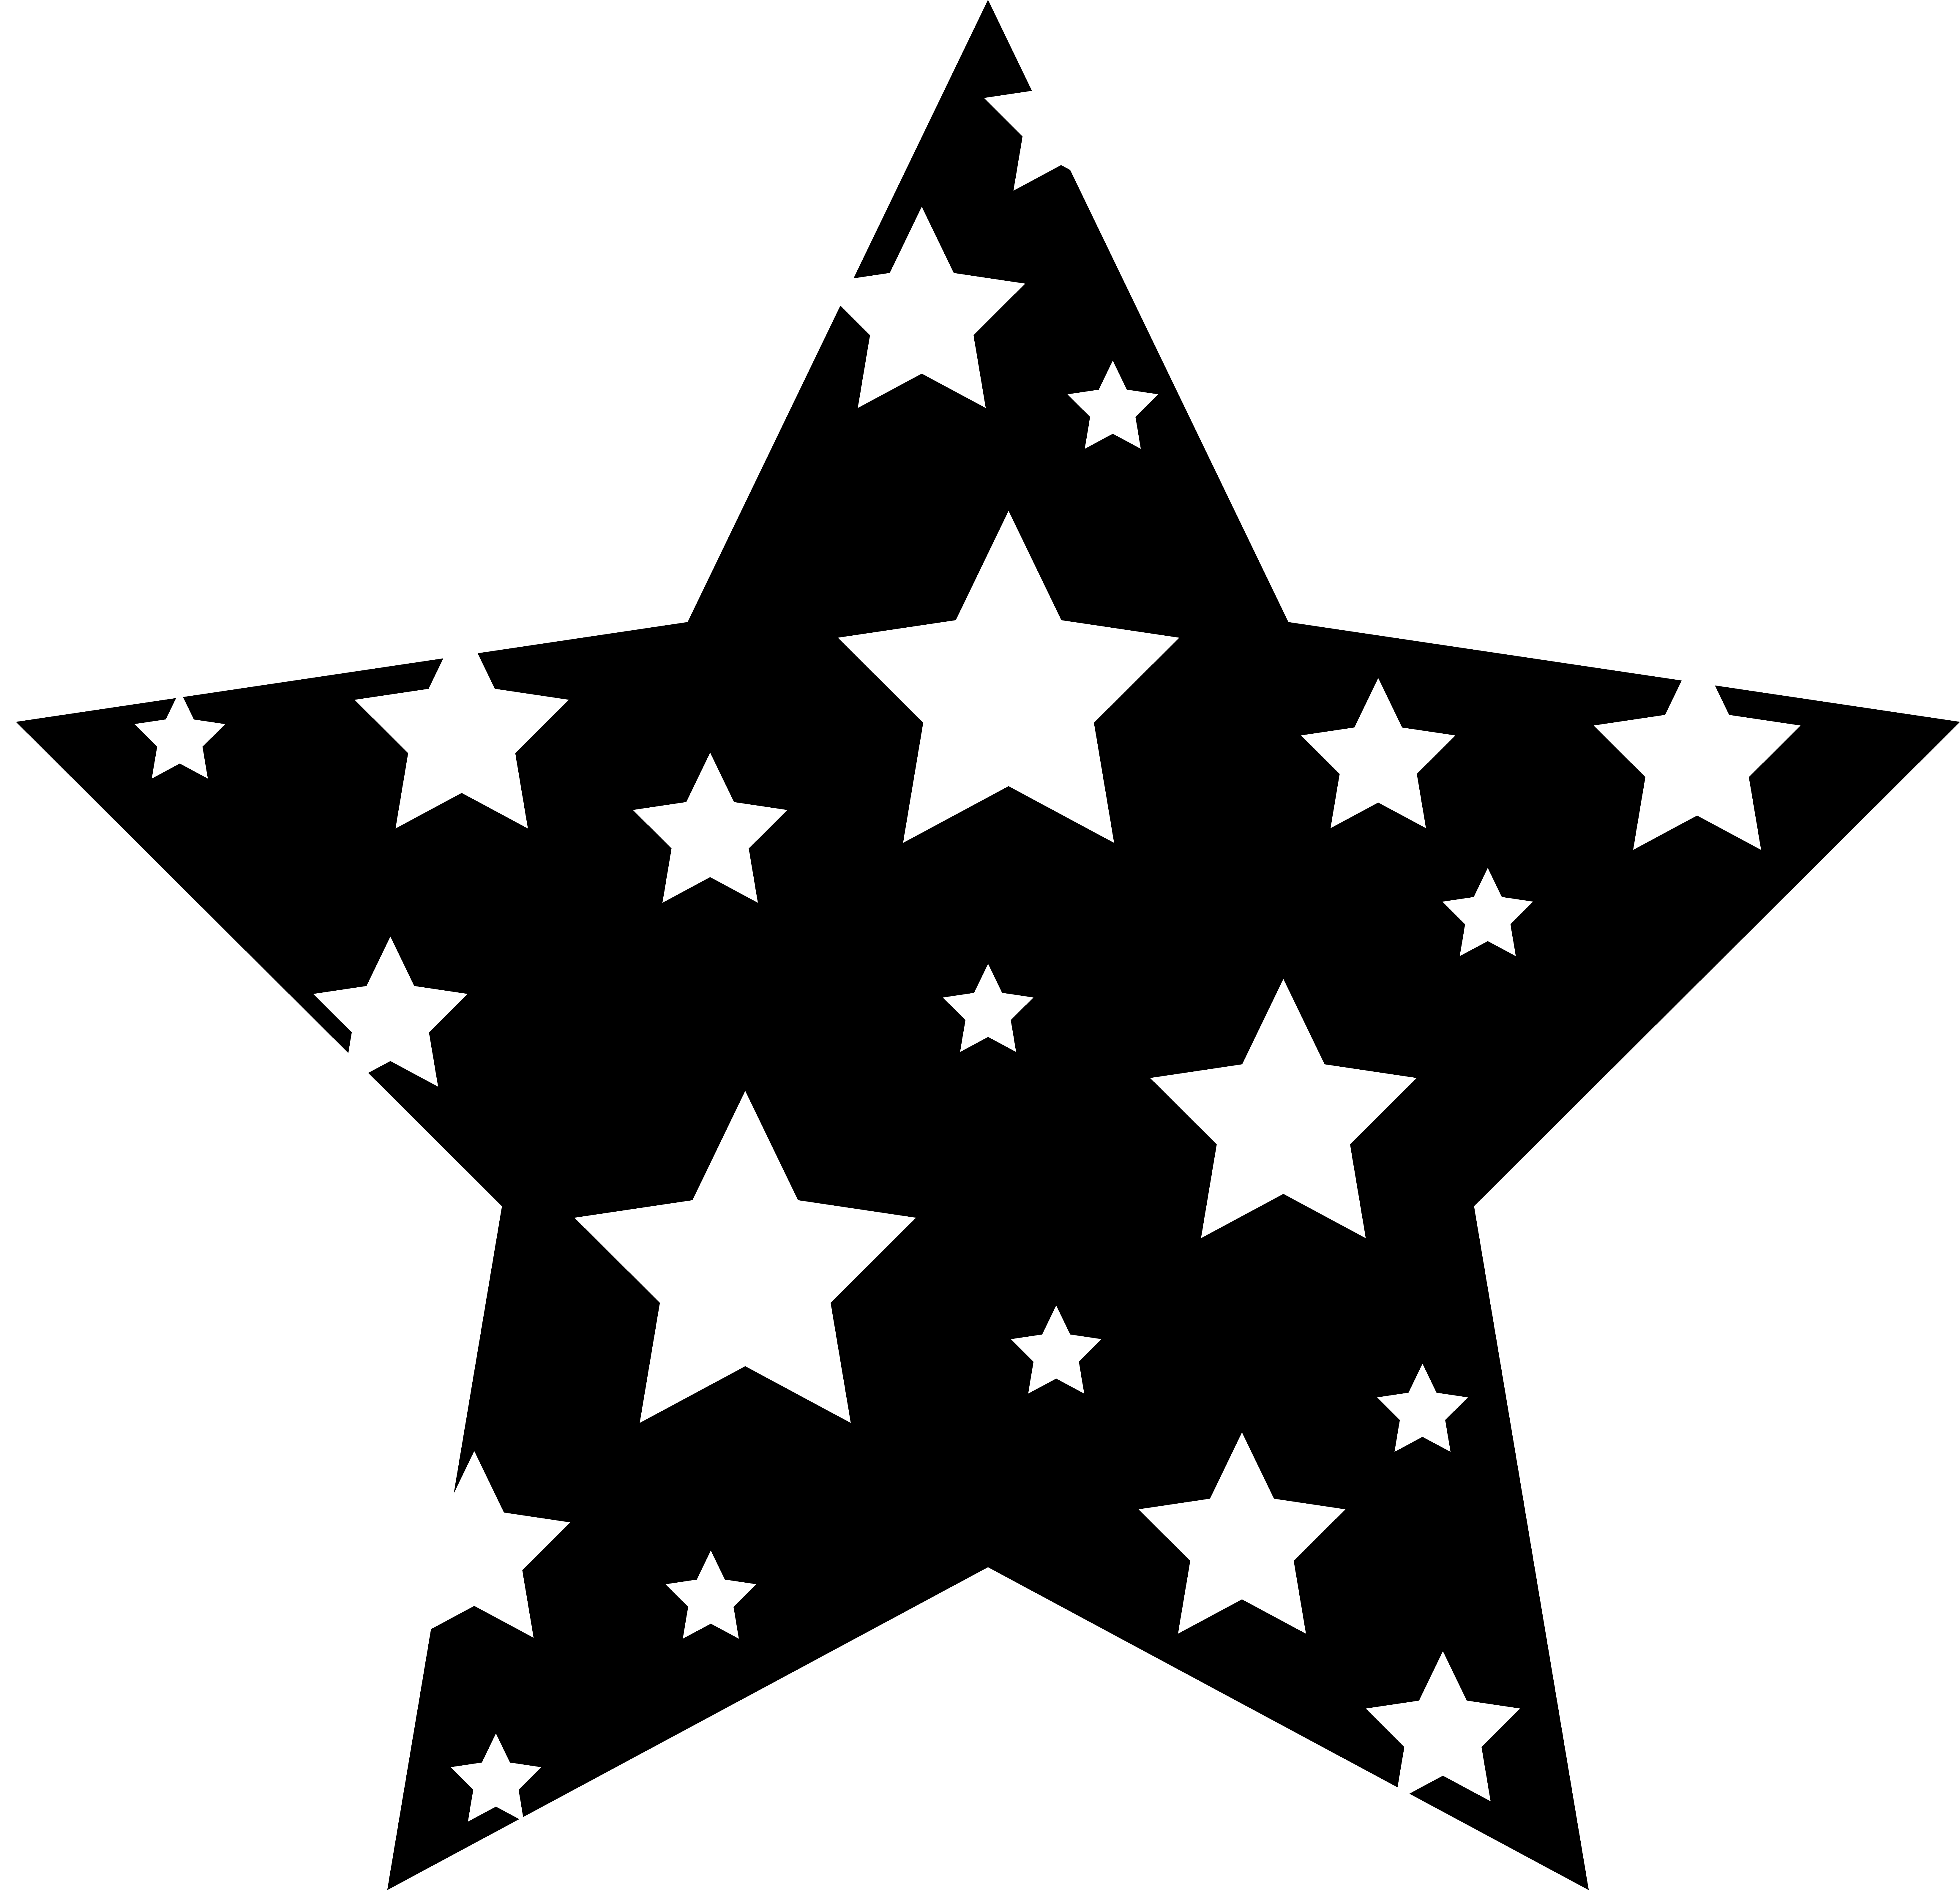 Explosions star shape pencil. Clipart explosion kapow